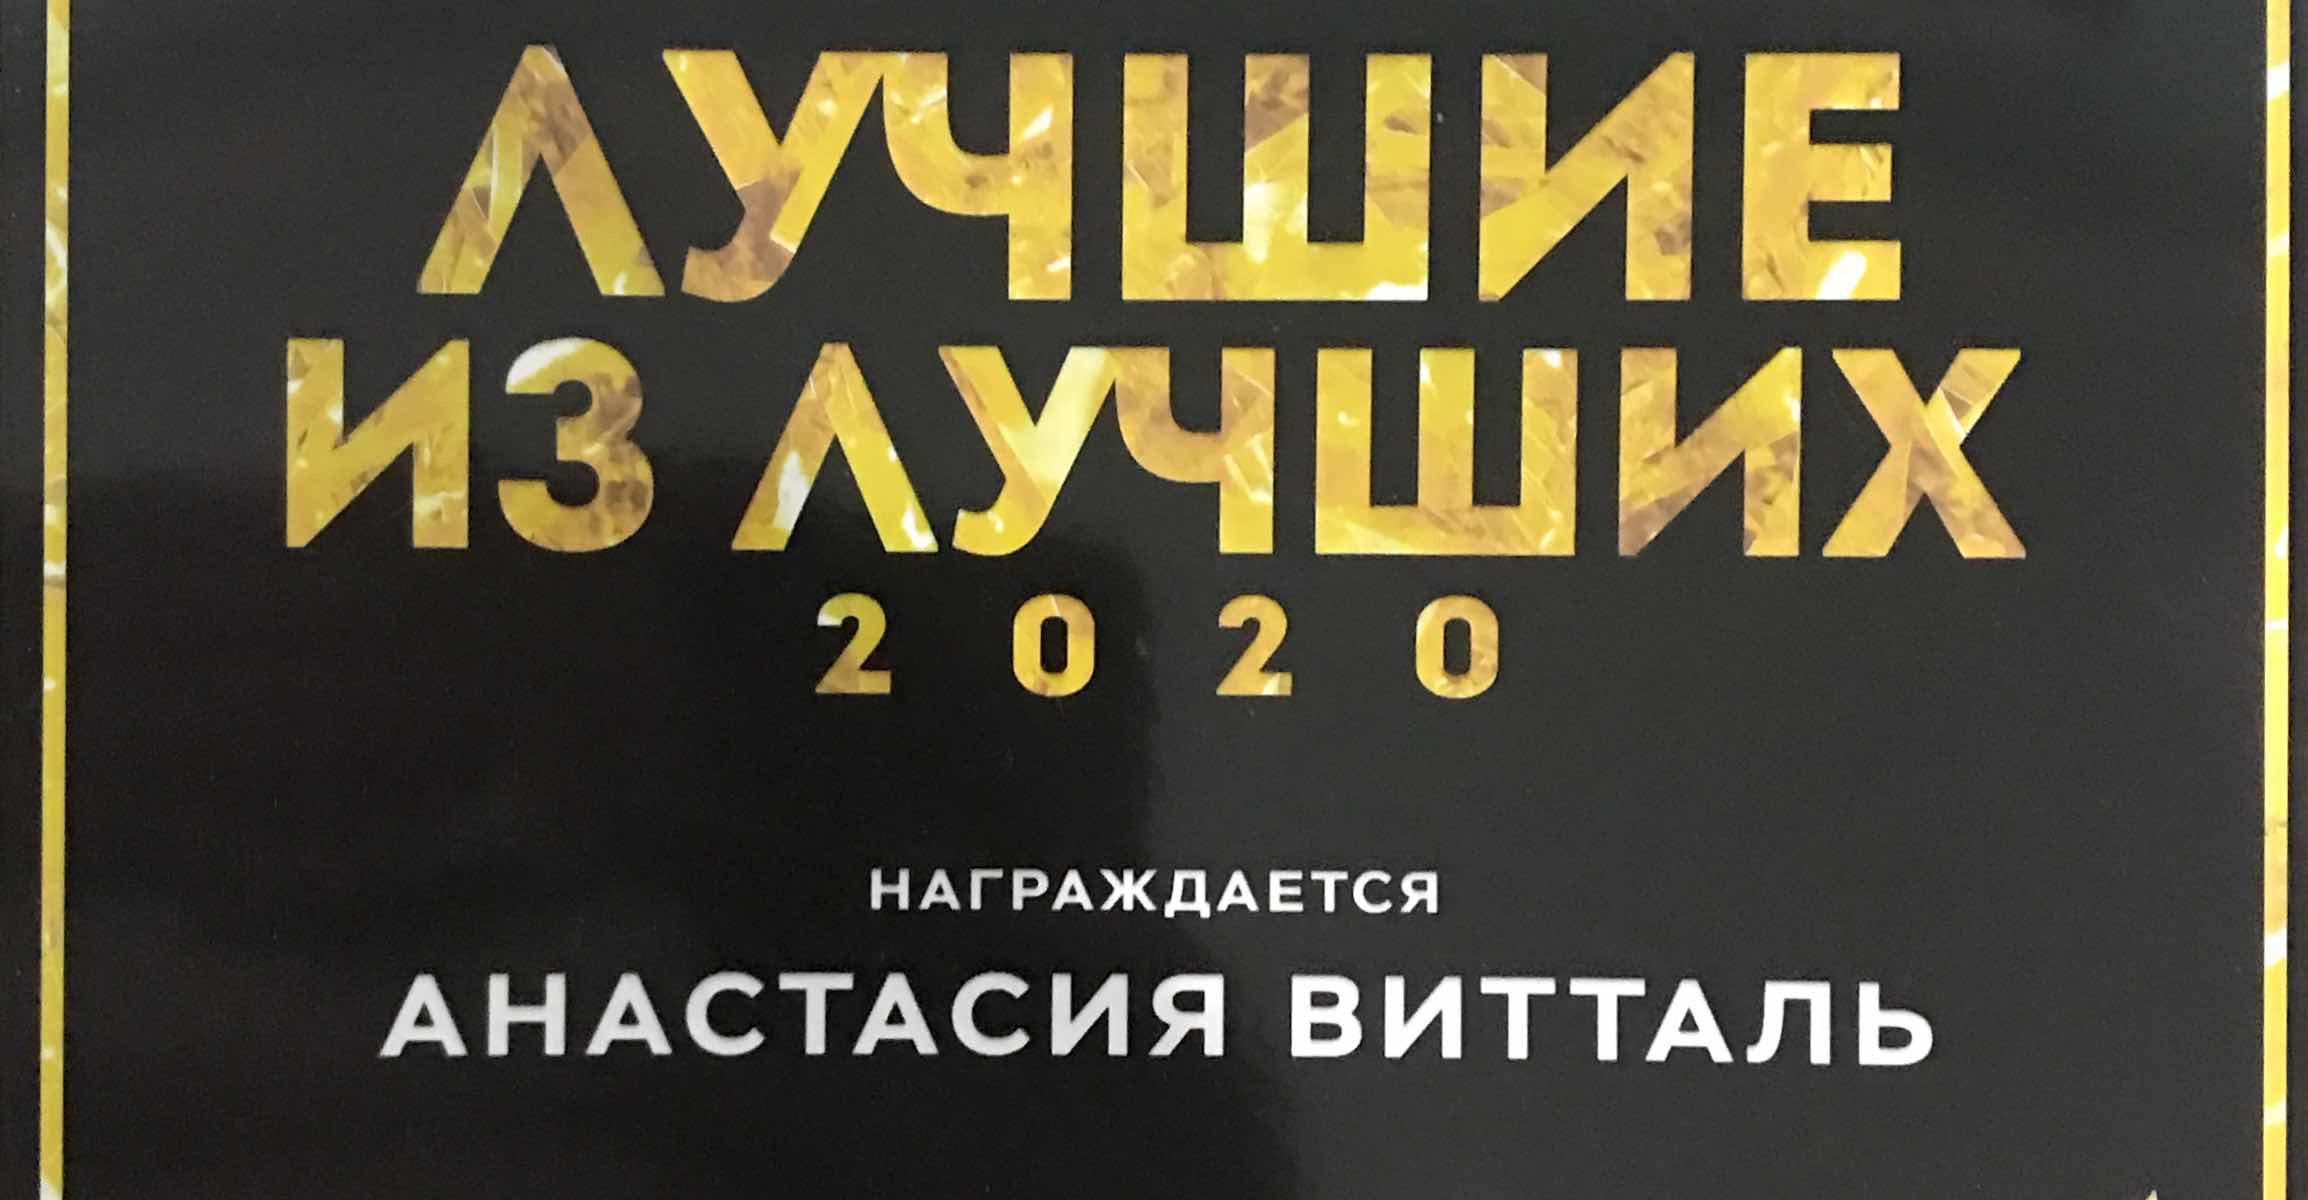 Анастасия Витталь – адвокат года 2020